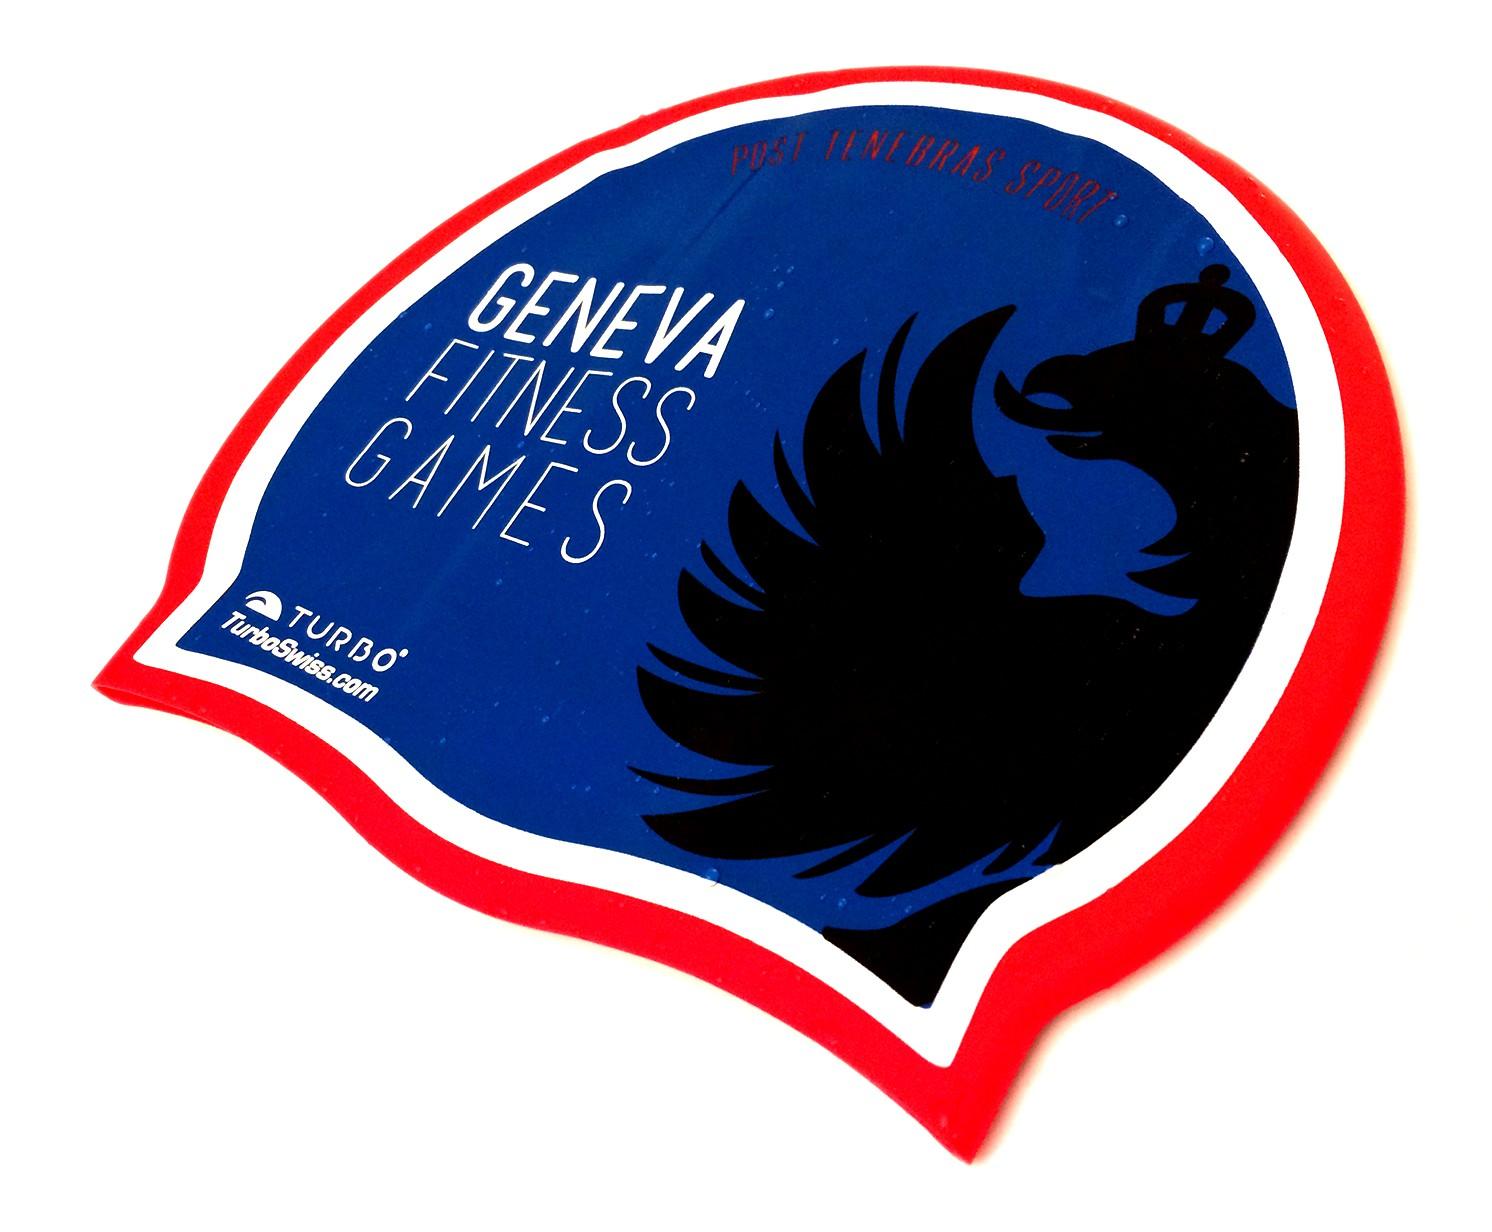 BONNET SILICONE GENEVA FITNESS GAMES